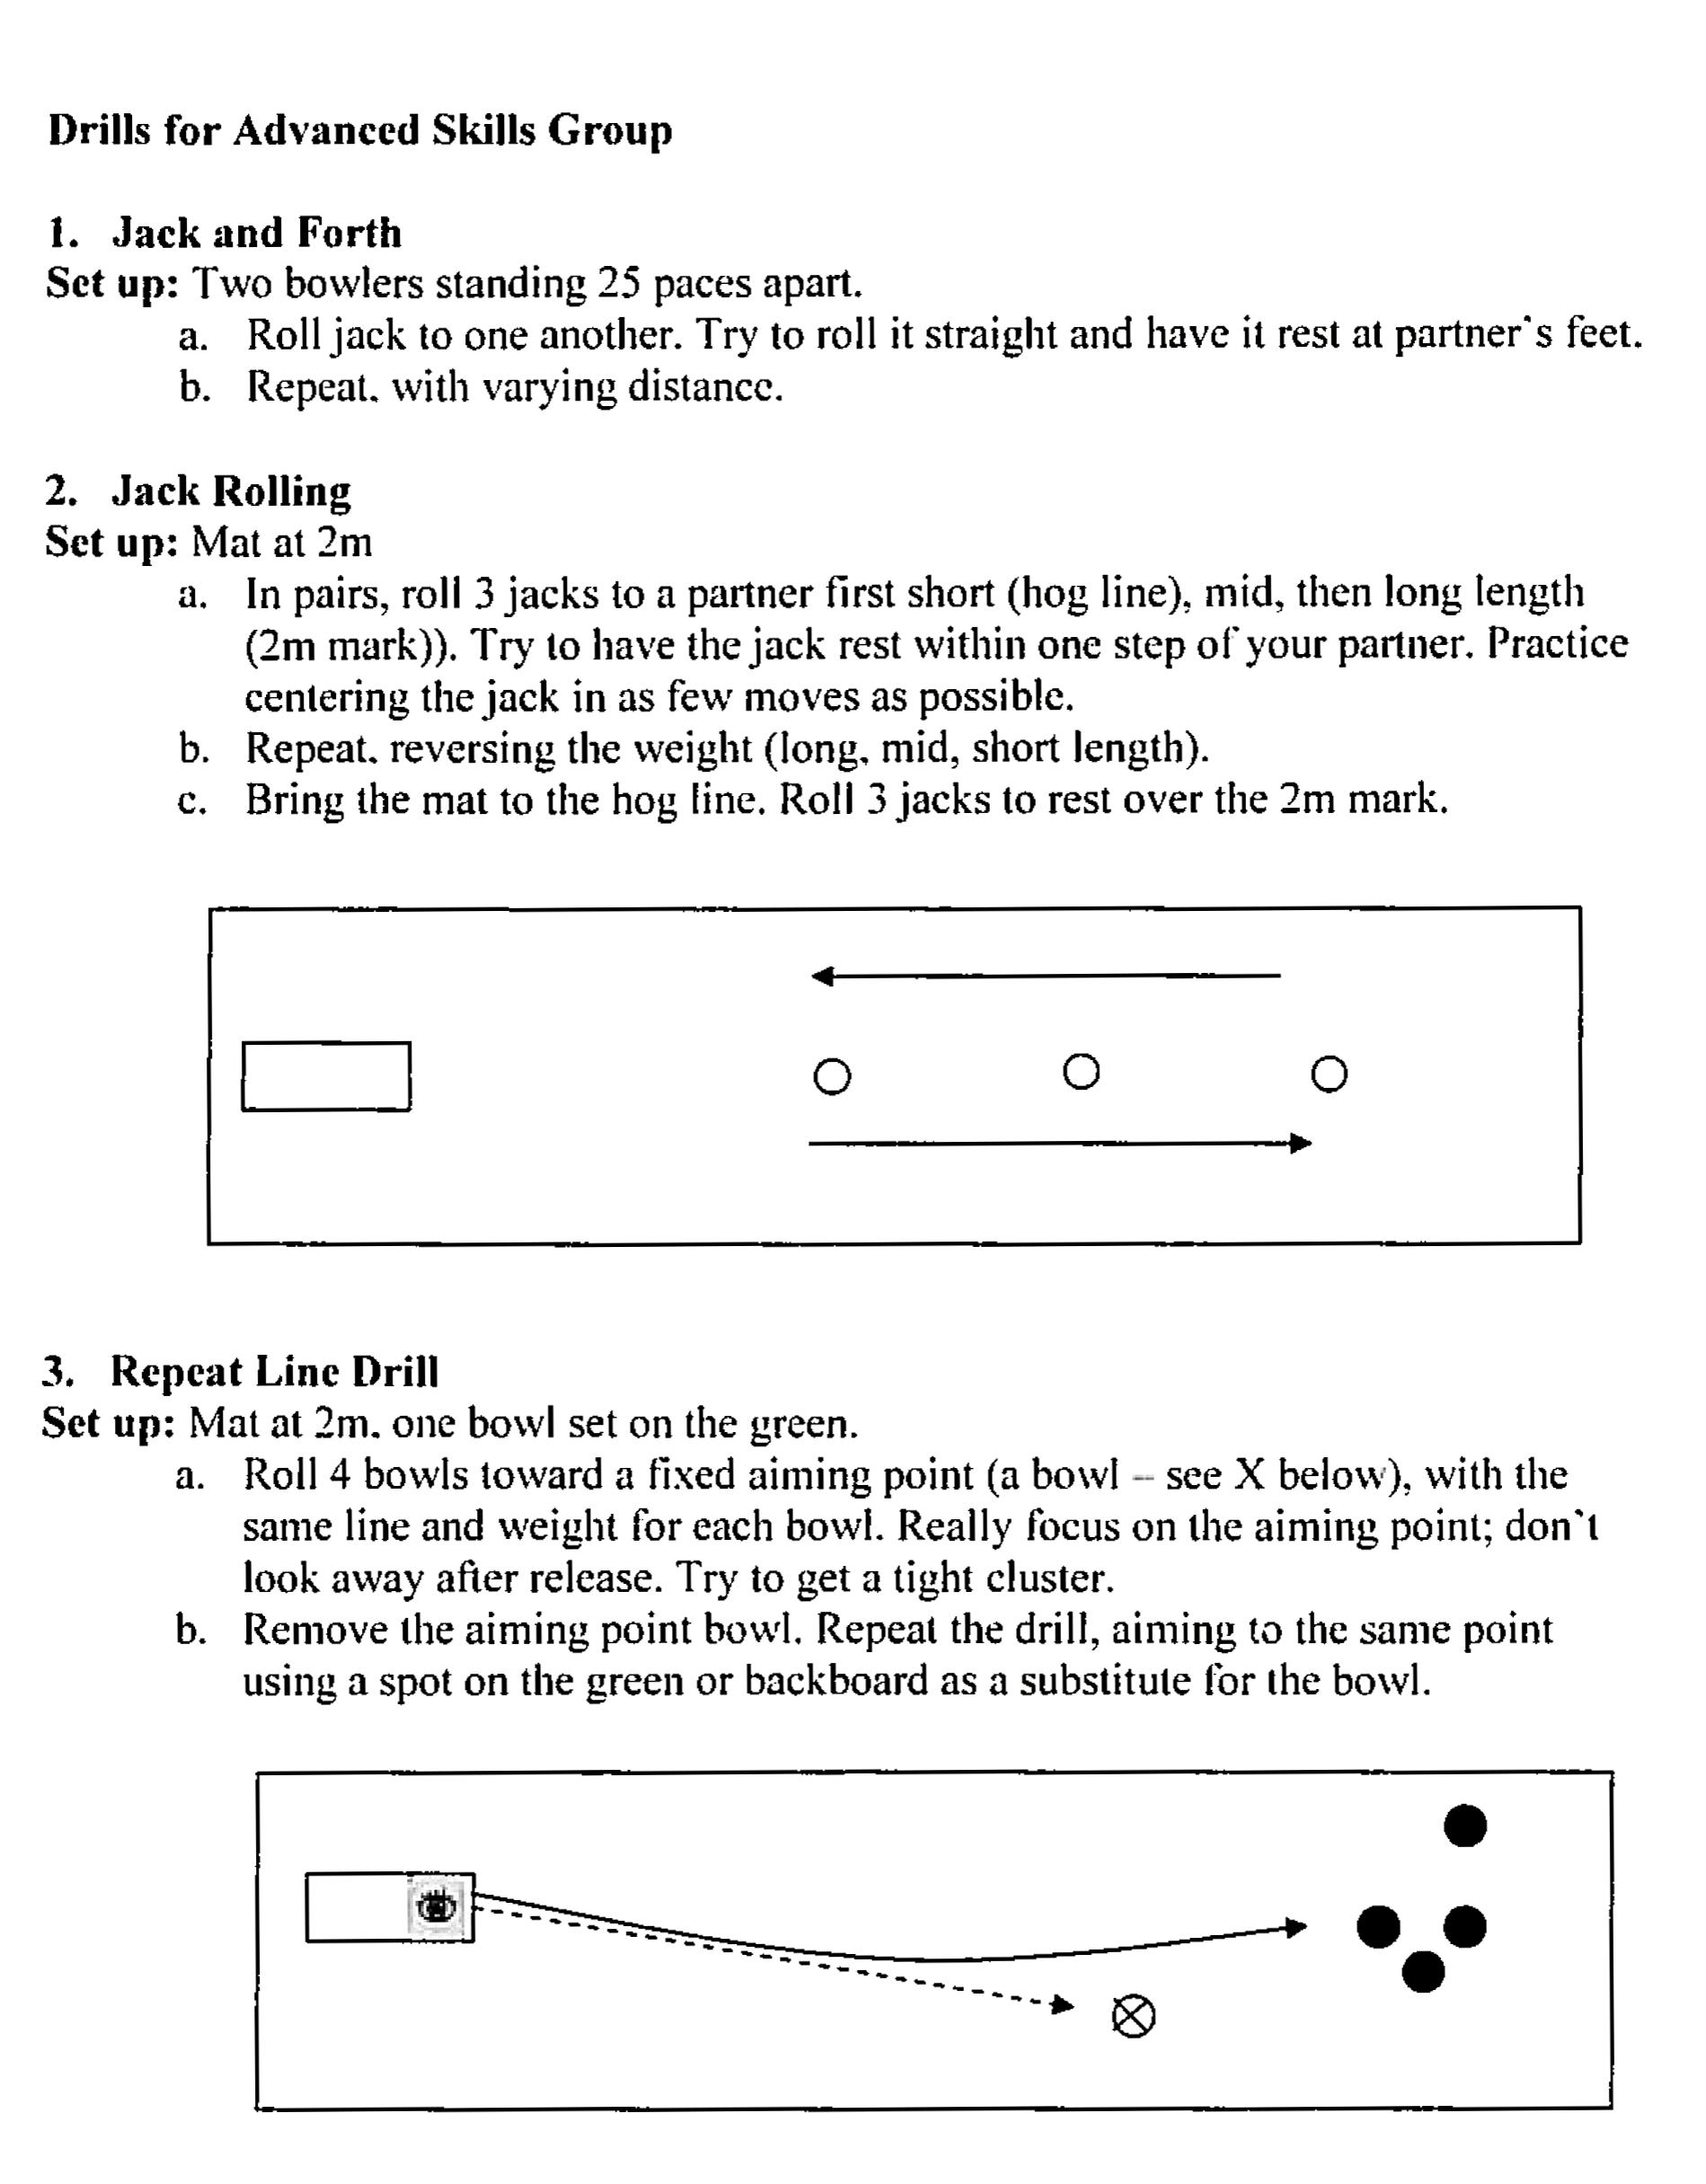 Lawn-Bowling-drills-1.png